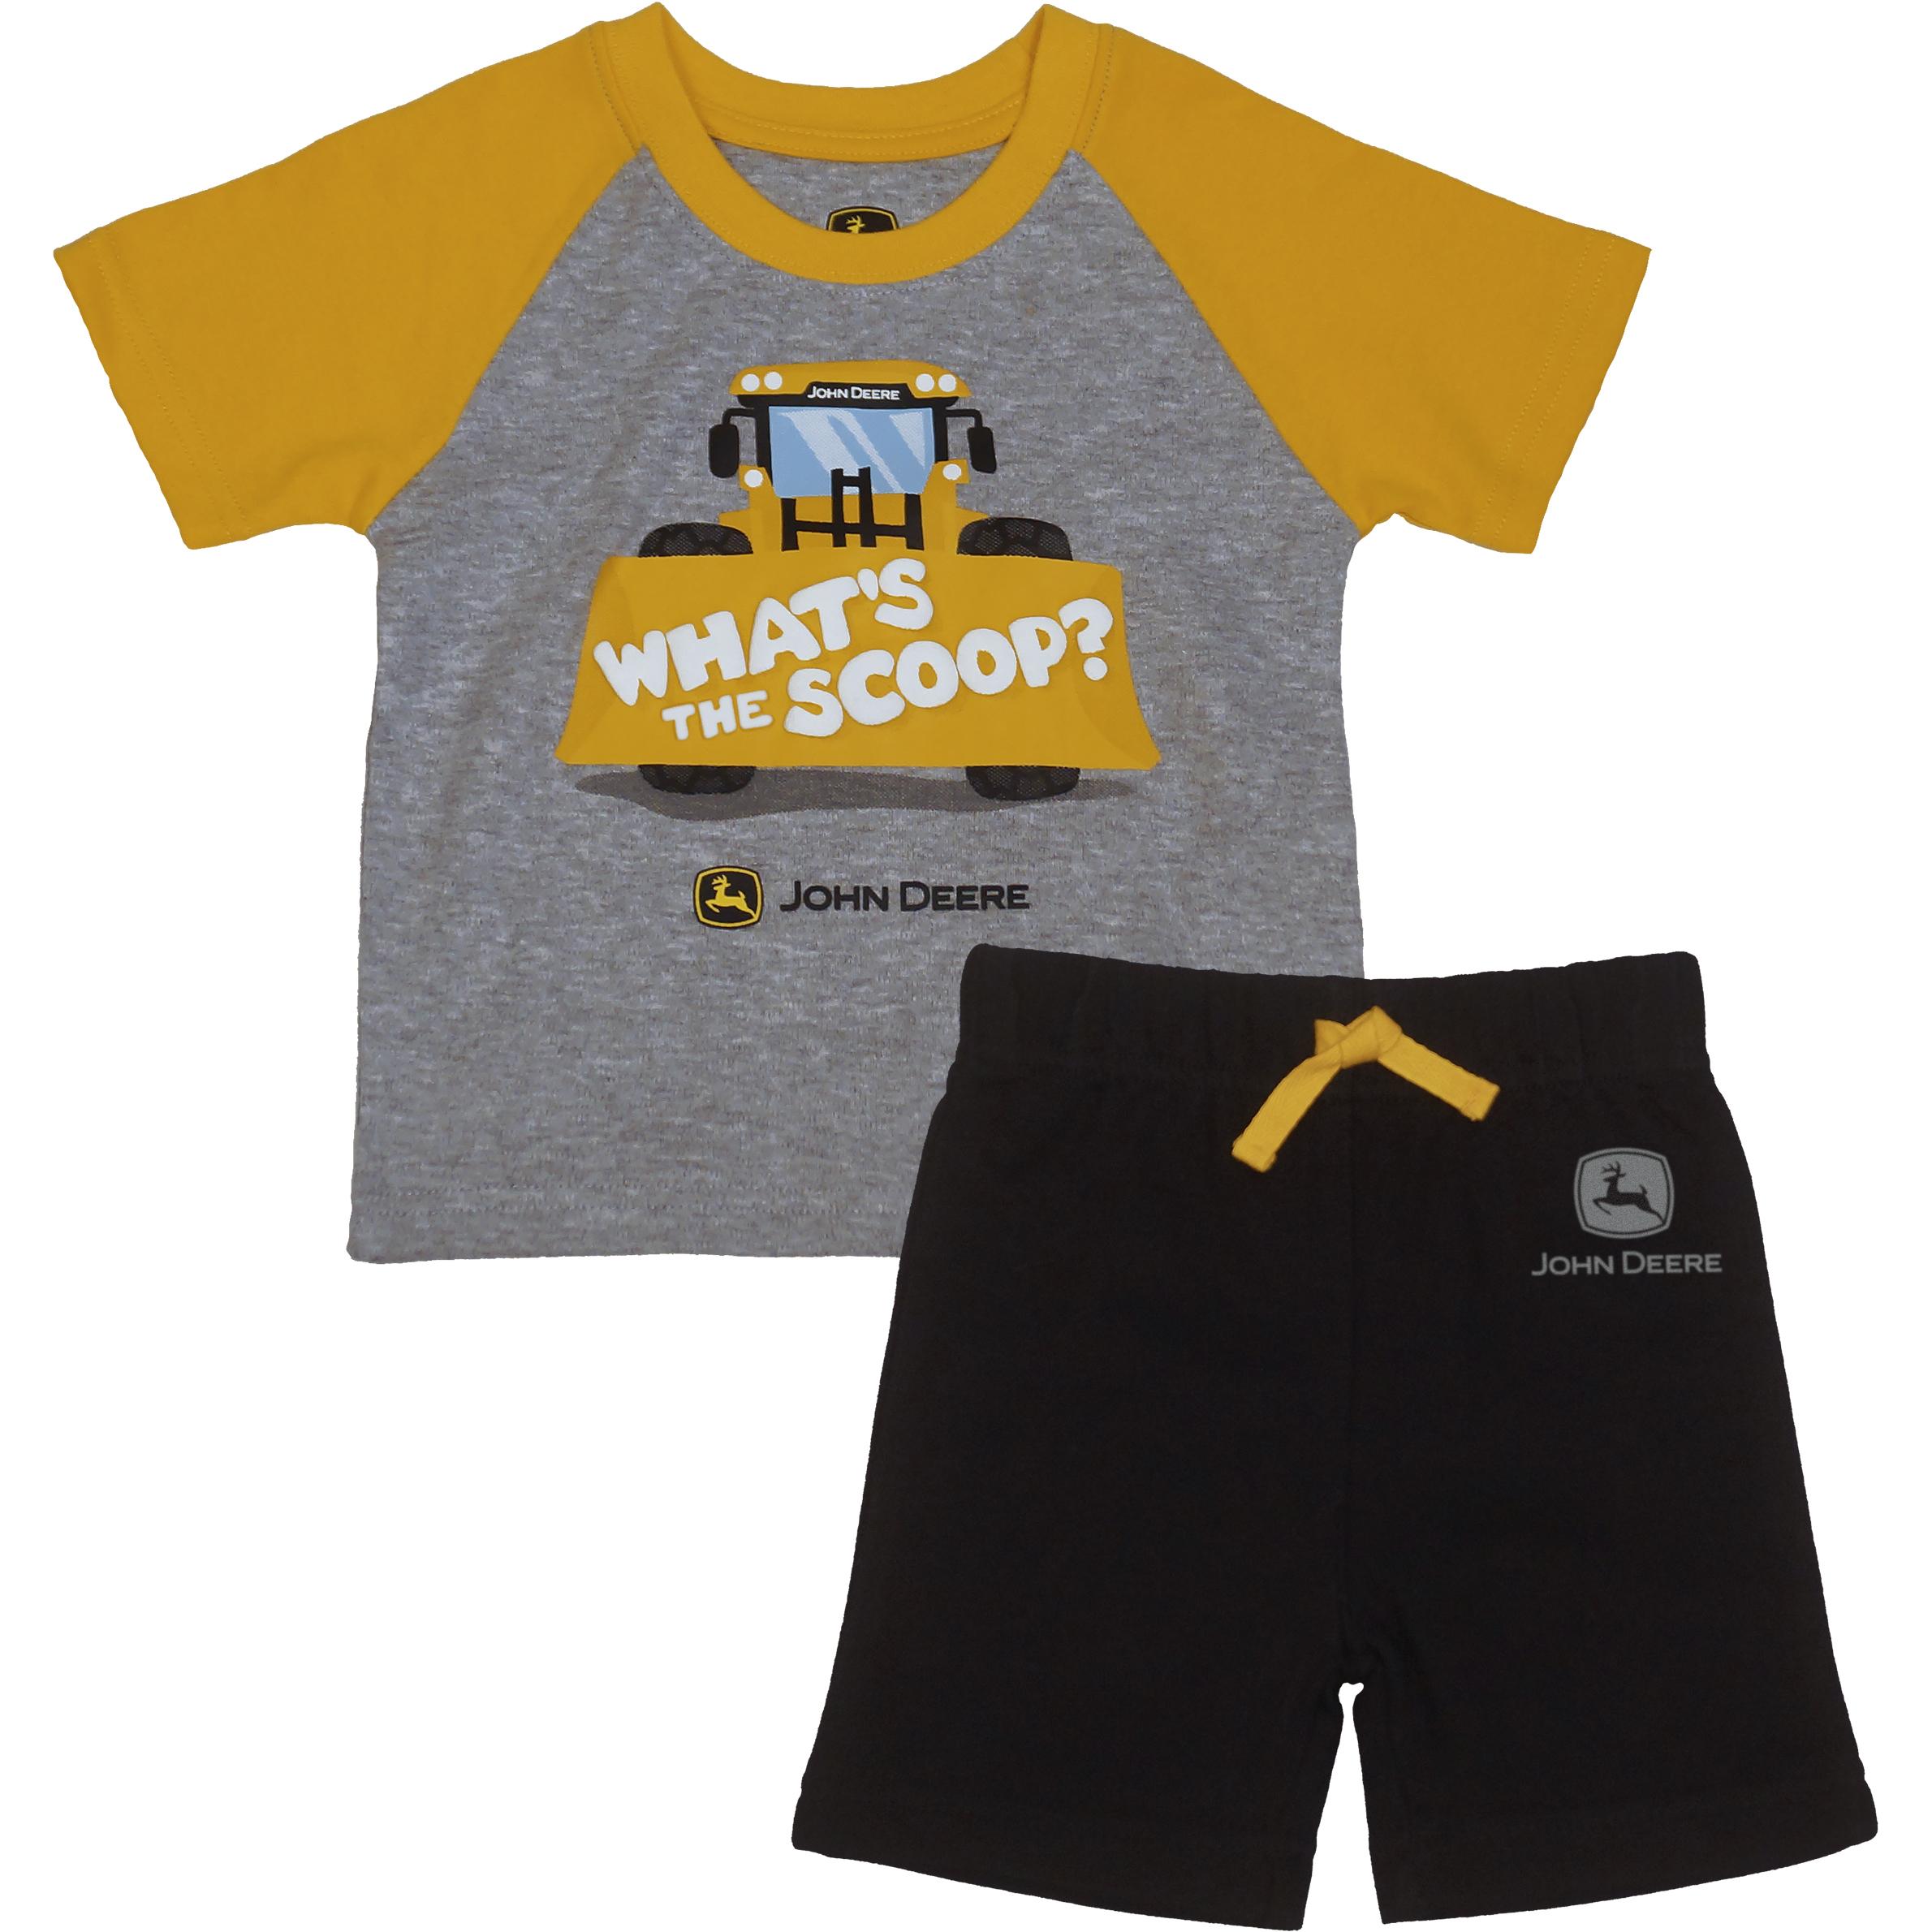 209e310b30c45 Infant, Toddler Boys' Clothes | Murdoch's